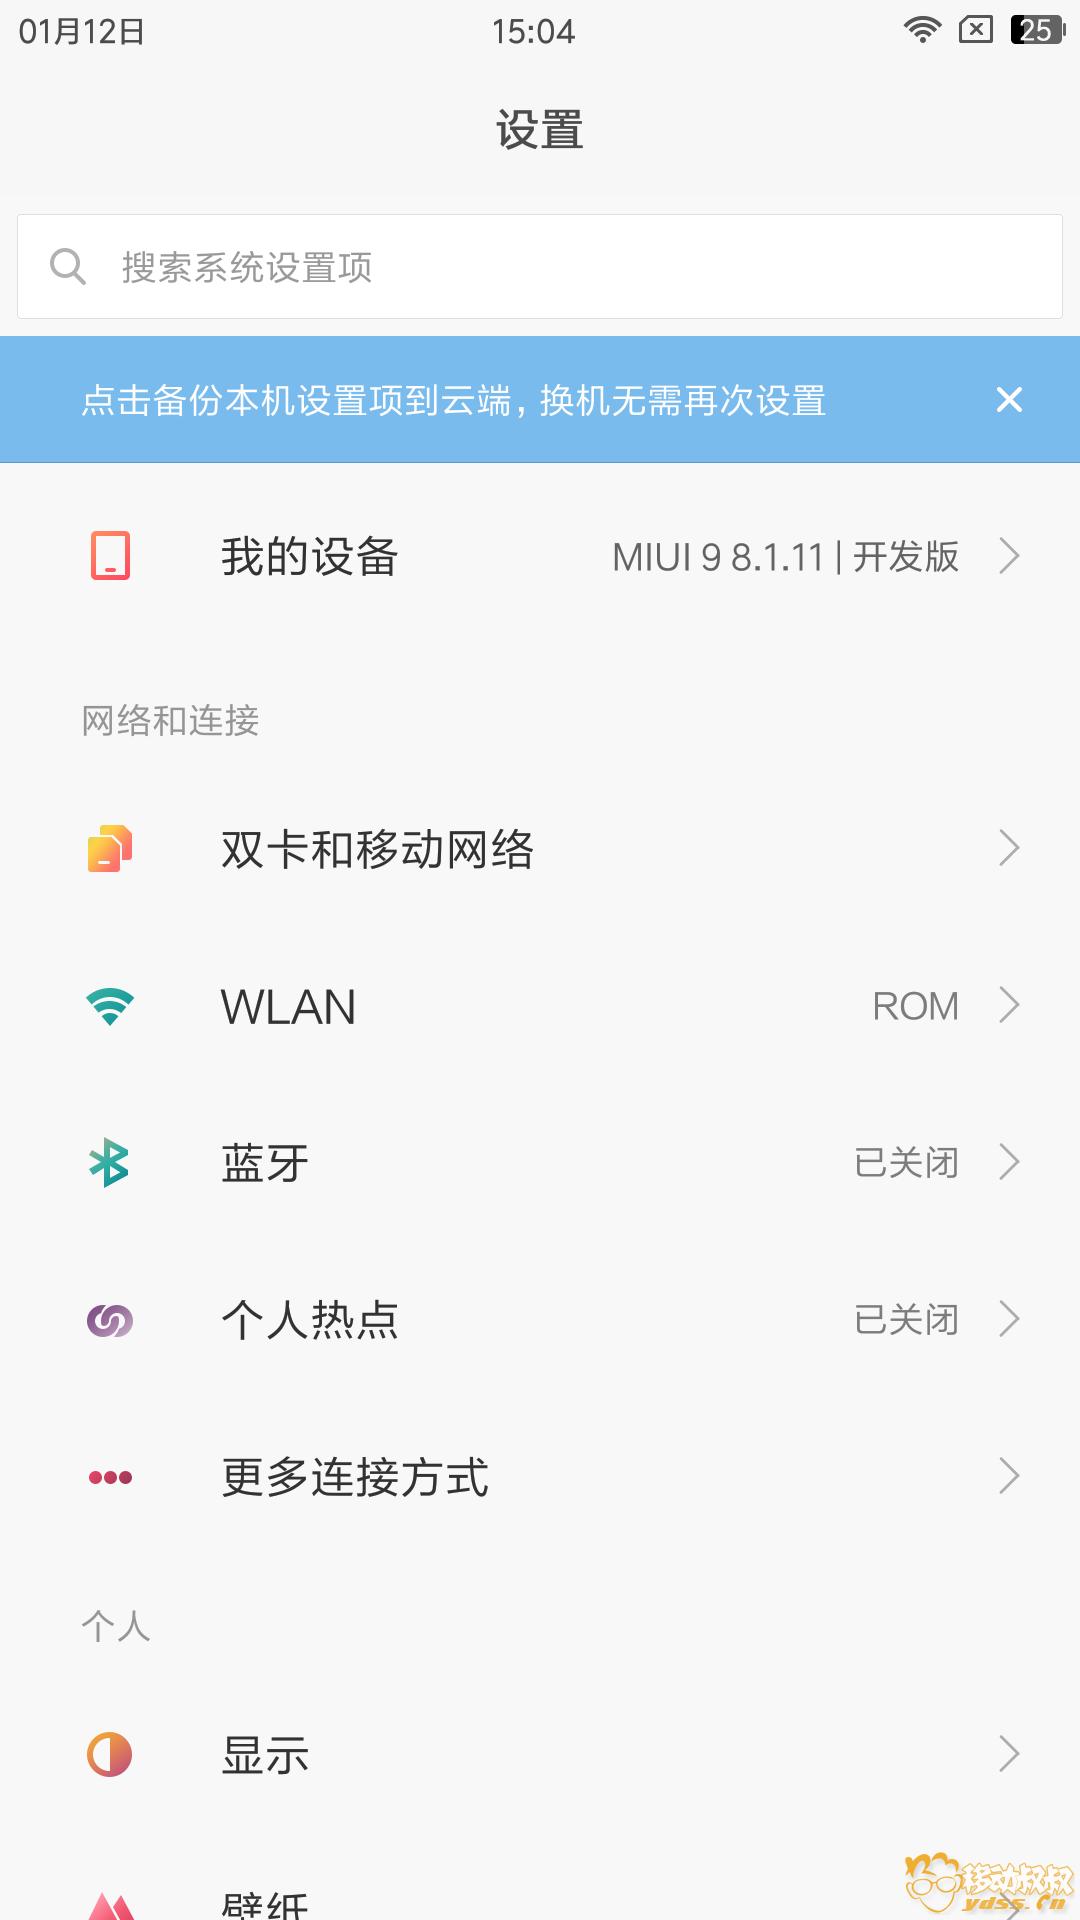 Screenshot_2018-01-12-15-04-25-938_com.android.settings[1].png